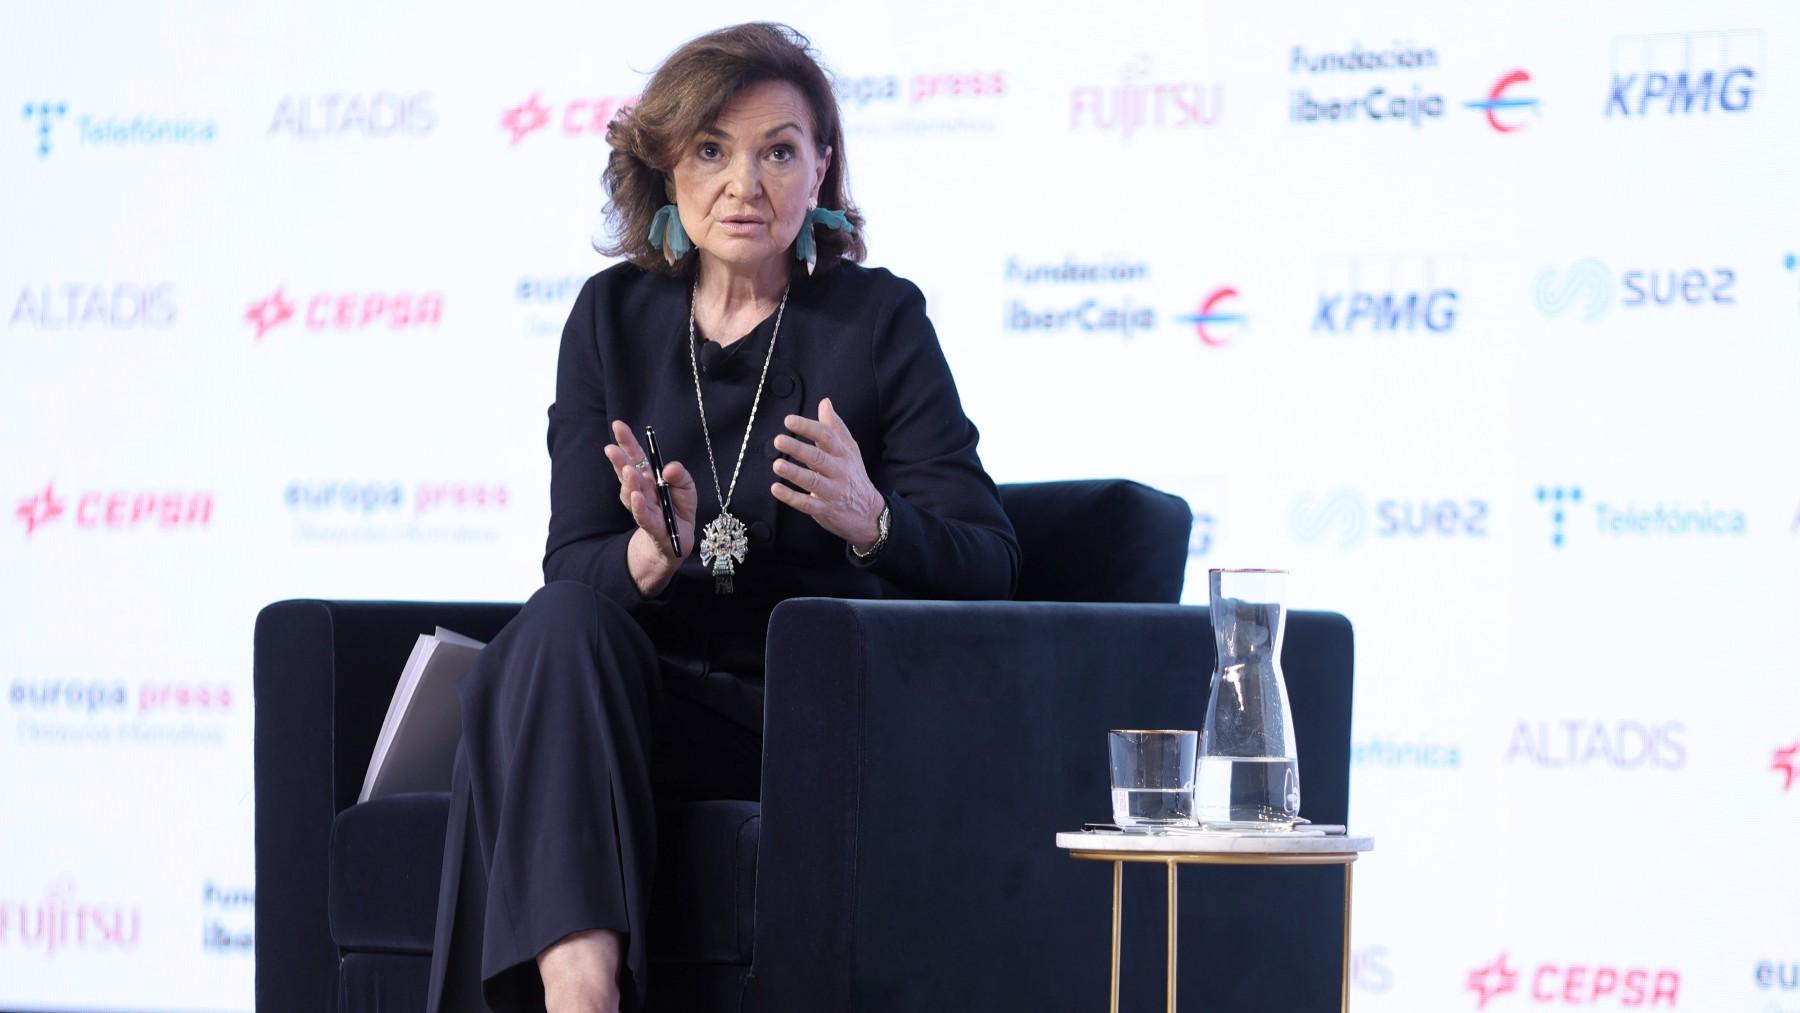 La vicepresidenta primera del Gobierno, Carmen Calvo. Foto: EP